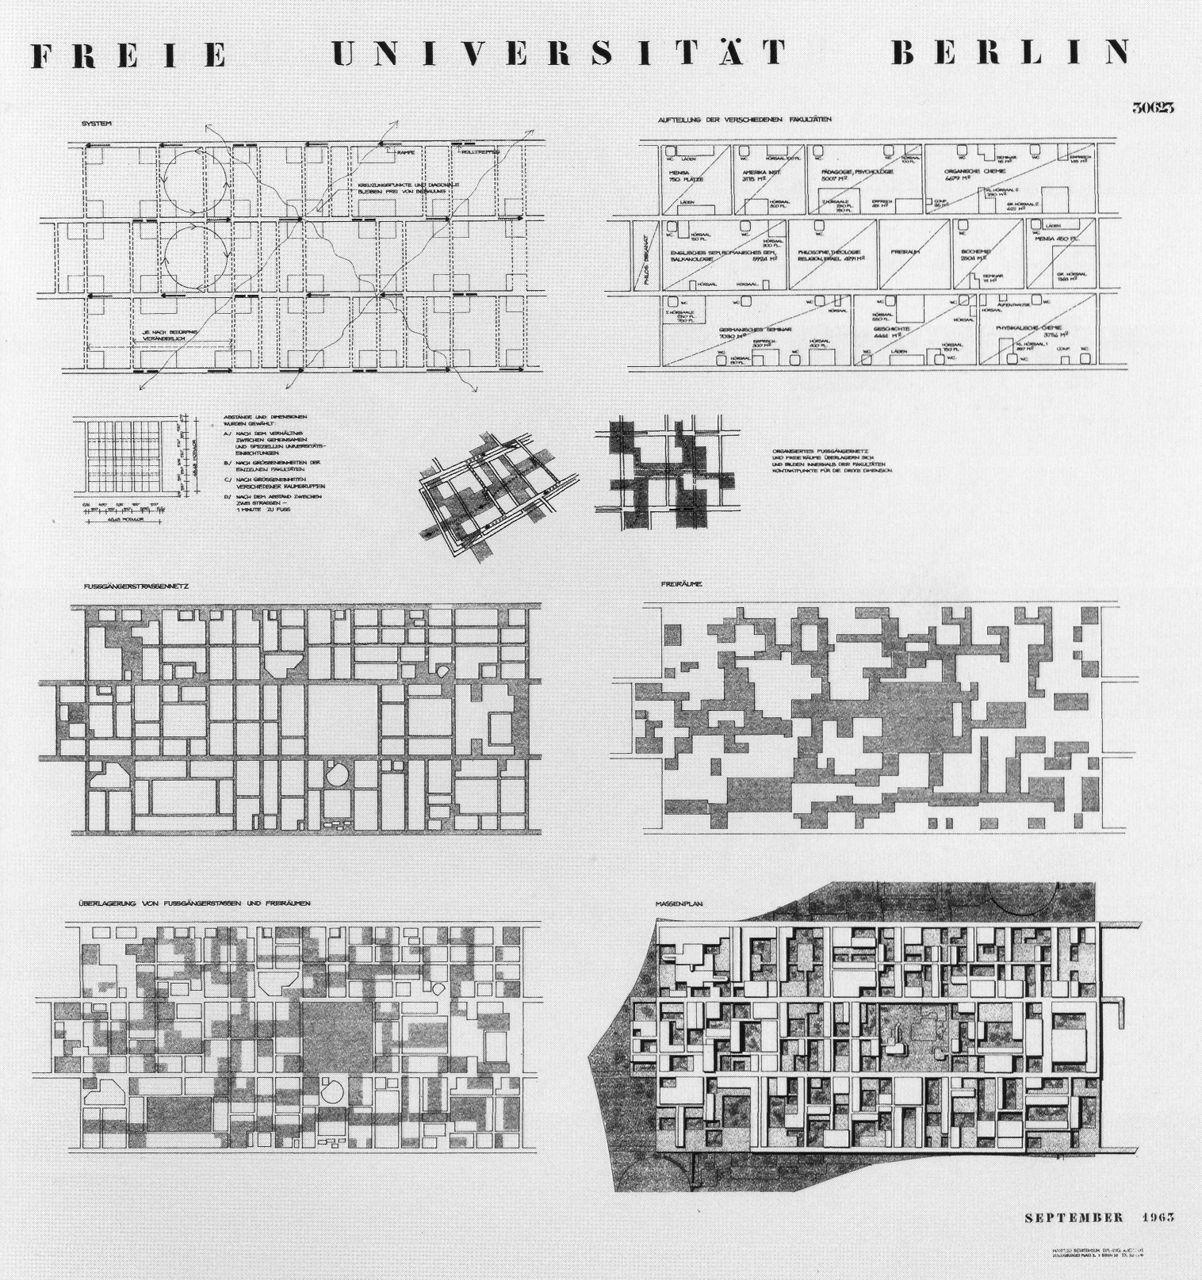 Candilis, Josic, Woods, Schiedhelm. Berlin Free University, 1963 ...